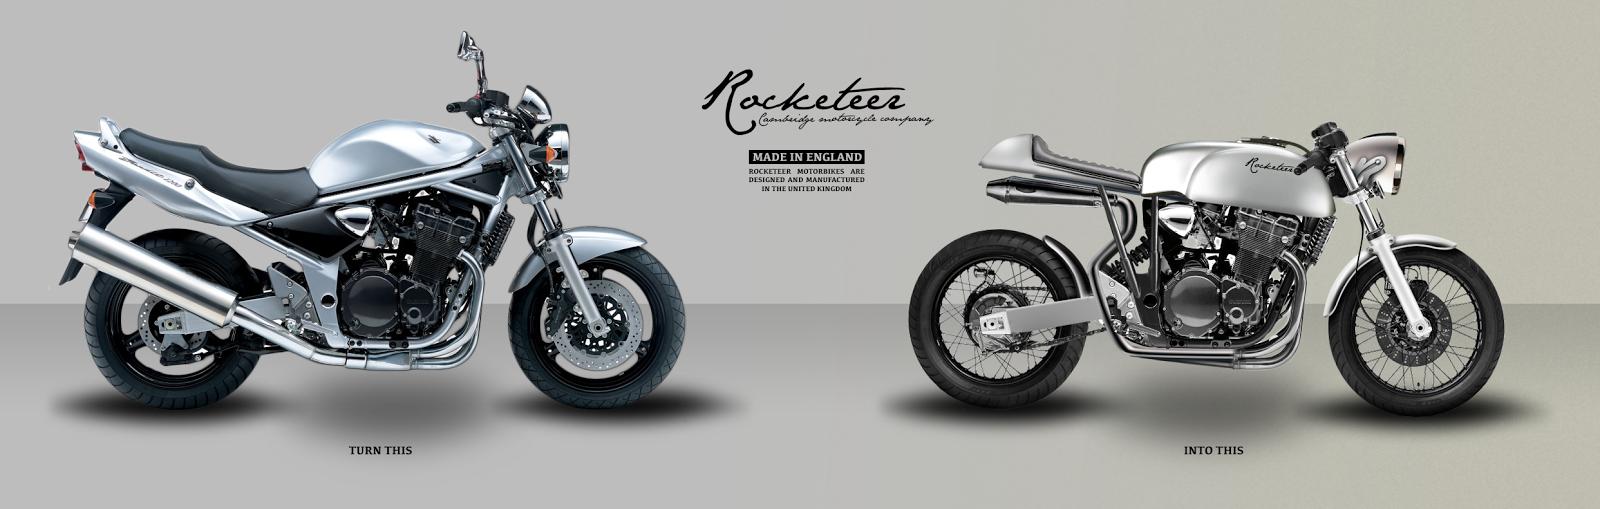 rocketeer motorcycles cambridgeshire cafe racers designs. Black Bedroom Furniture Sets. Home Design Ideas